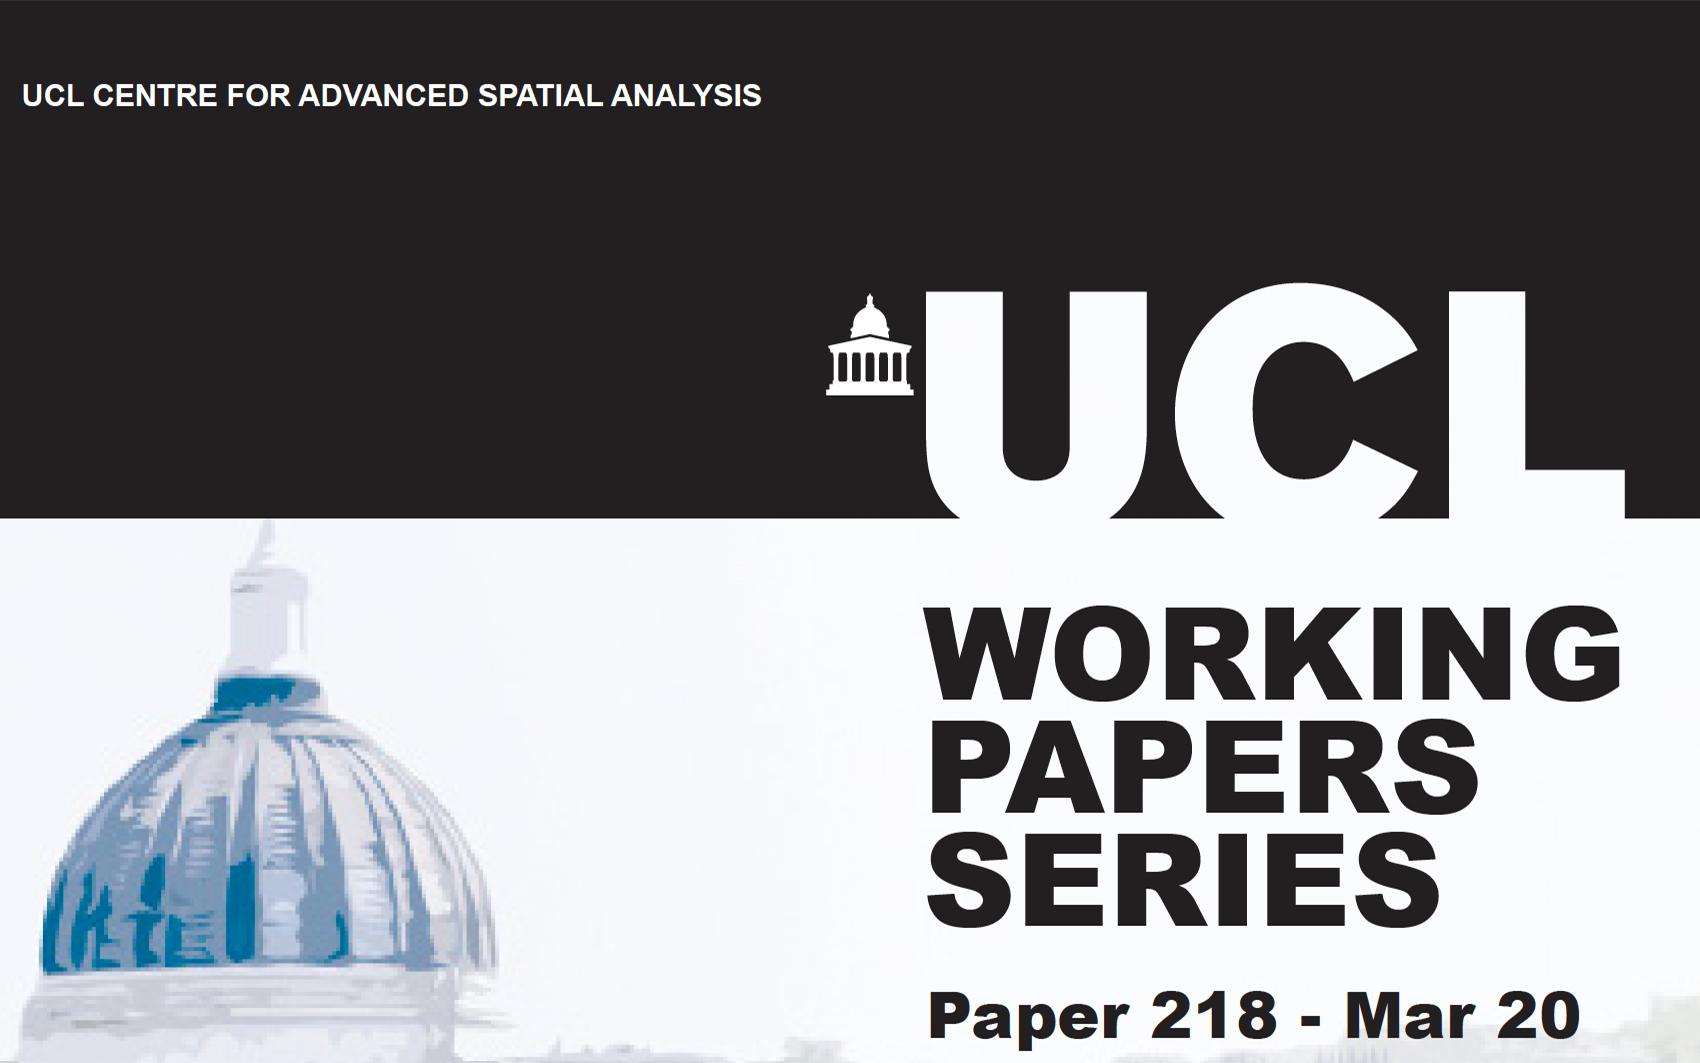 CASA Working Paper